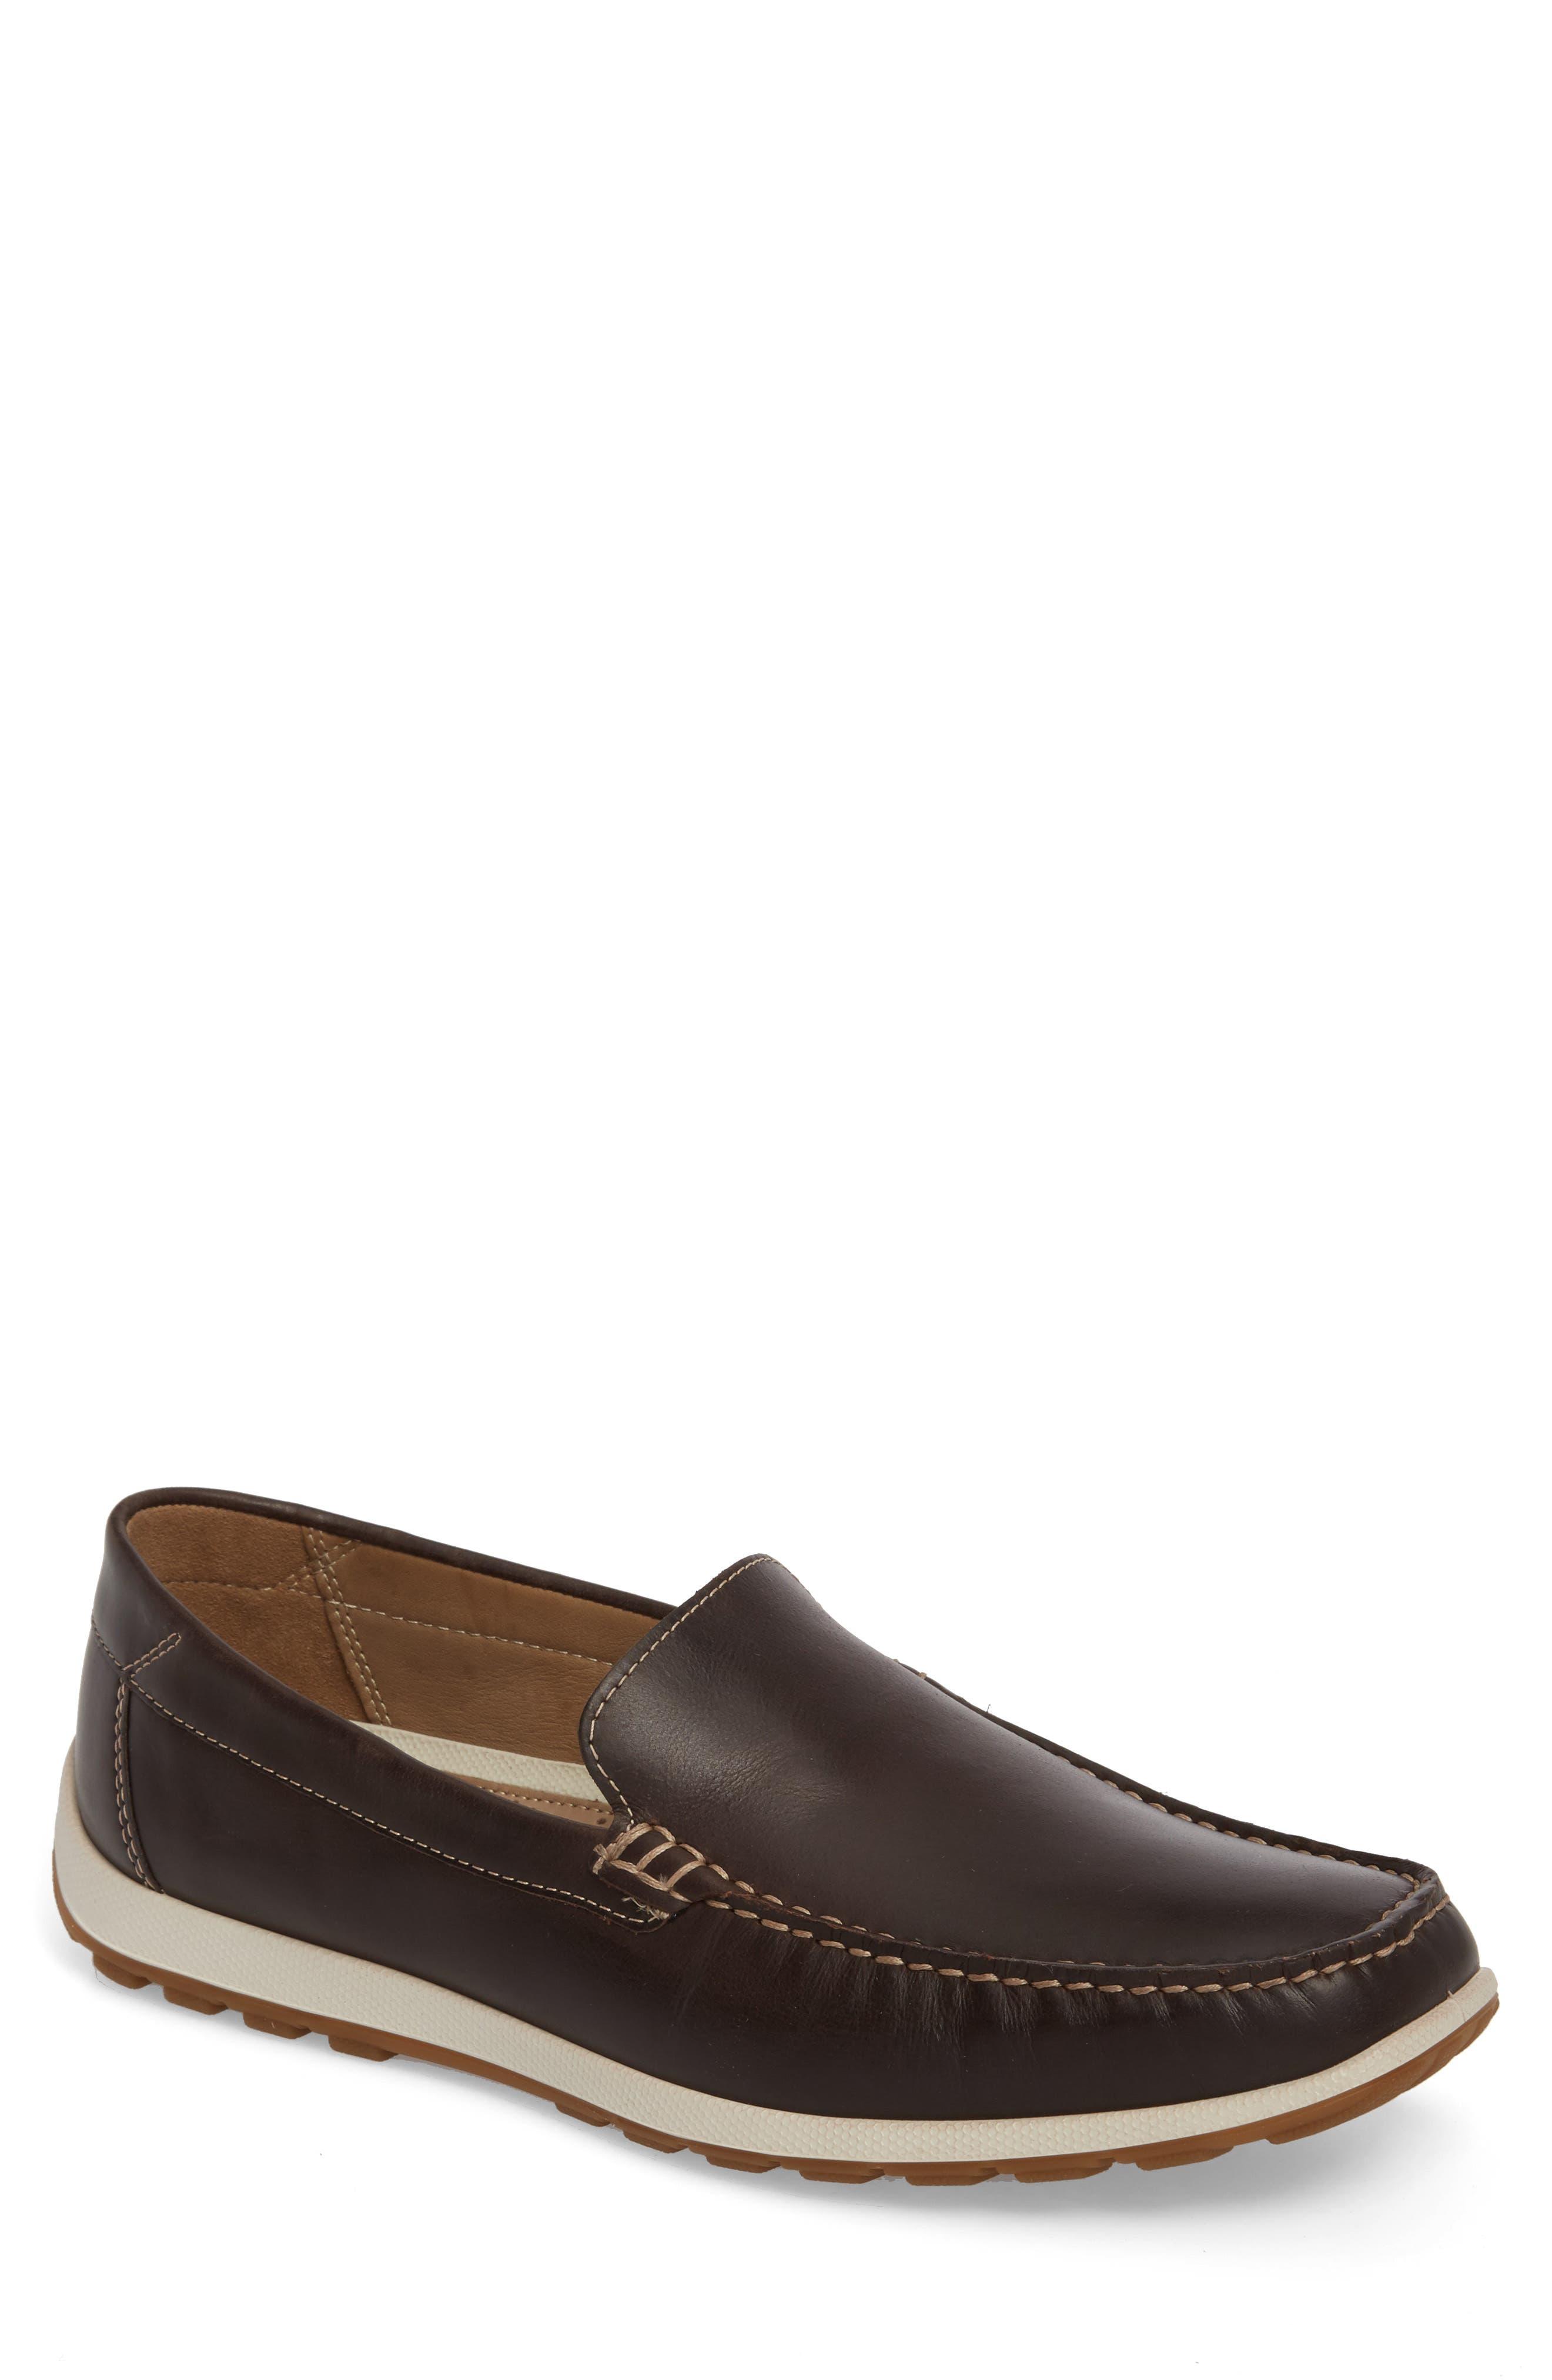 Dip Moc Toe Driving Loafer,                             Main thumbnail 1, color,                             Mocha Leather